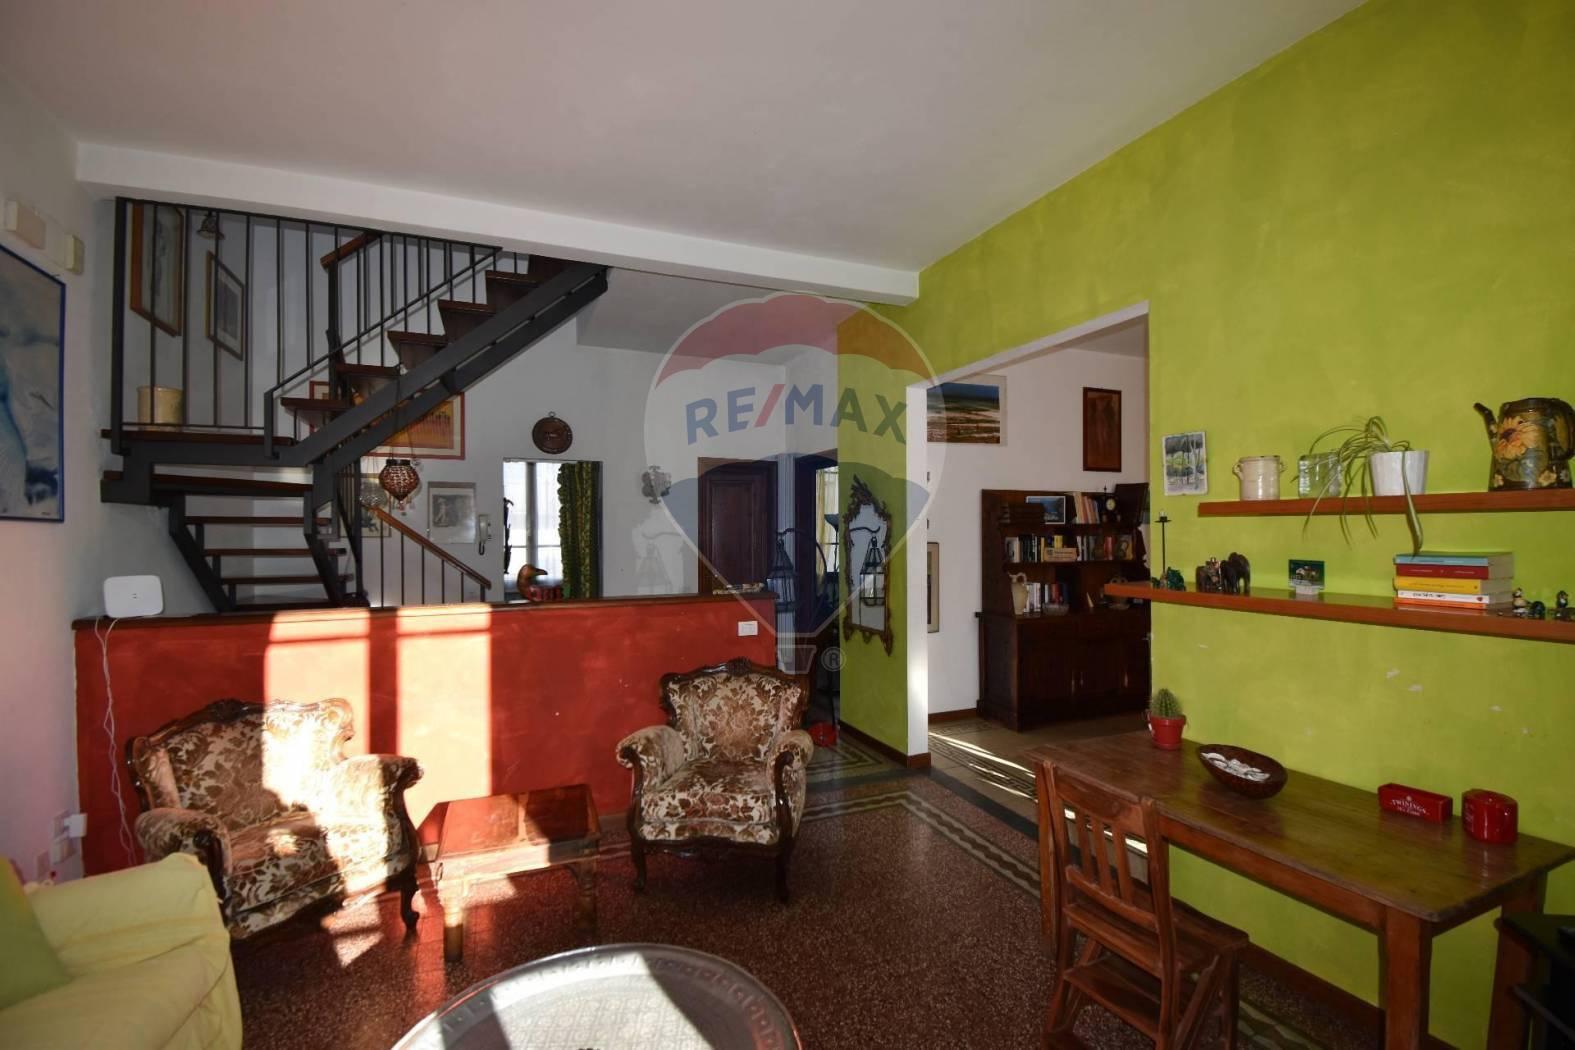 viareggio affitto quart: darsena re-max-quality-house